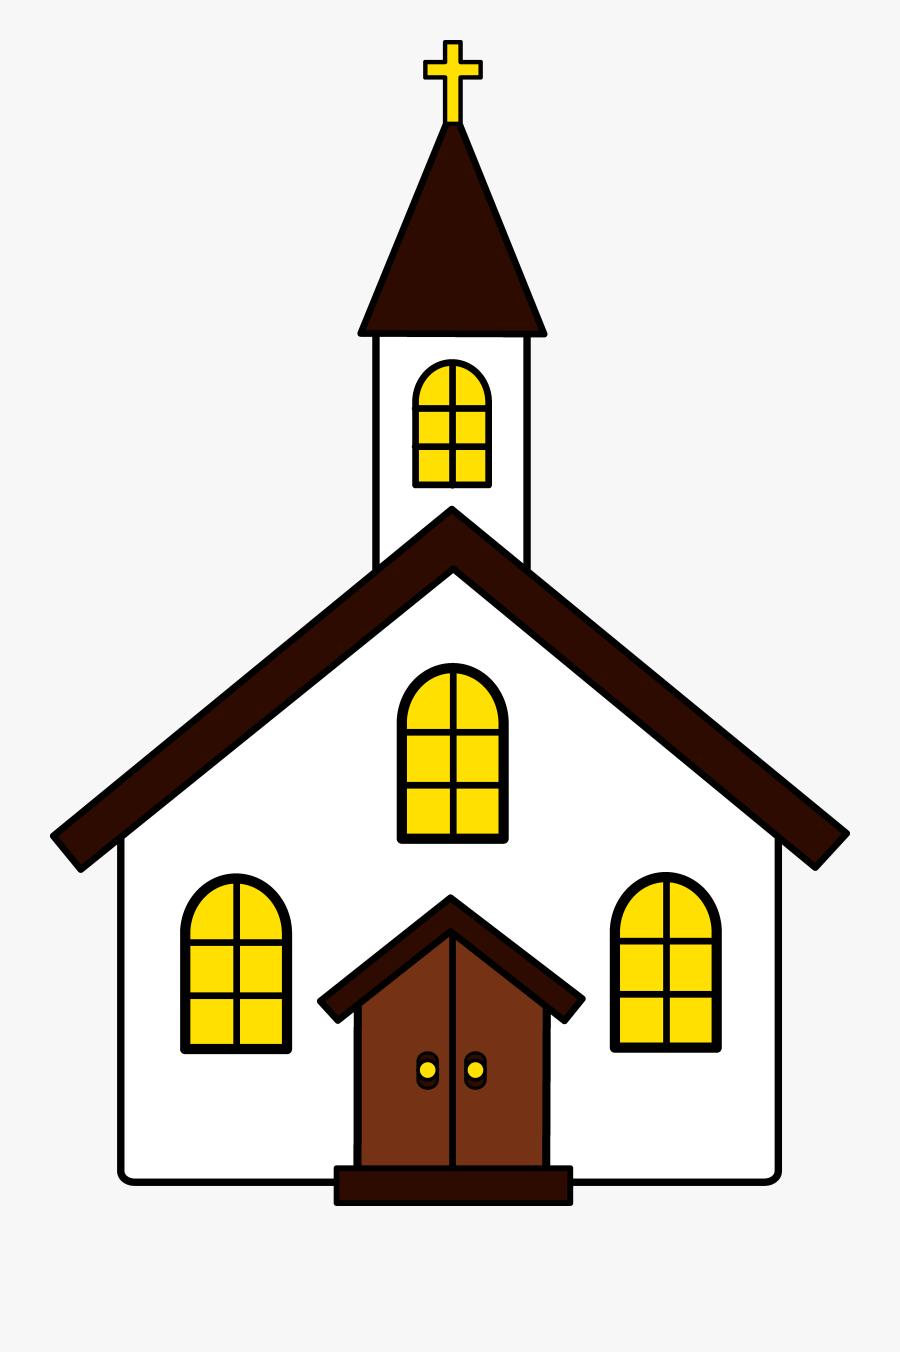 Black Church Clip Art Free Clipart Images - Church Clipart, Transparent Clipart